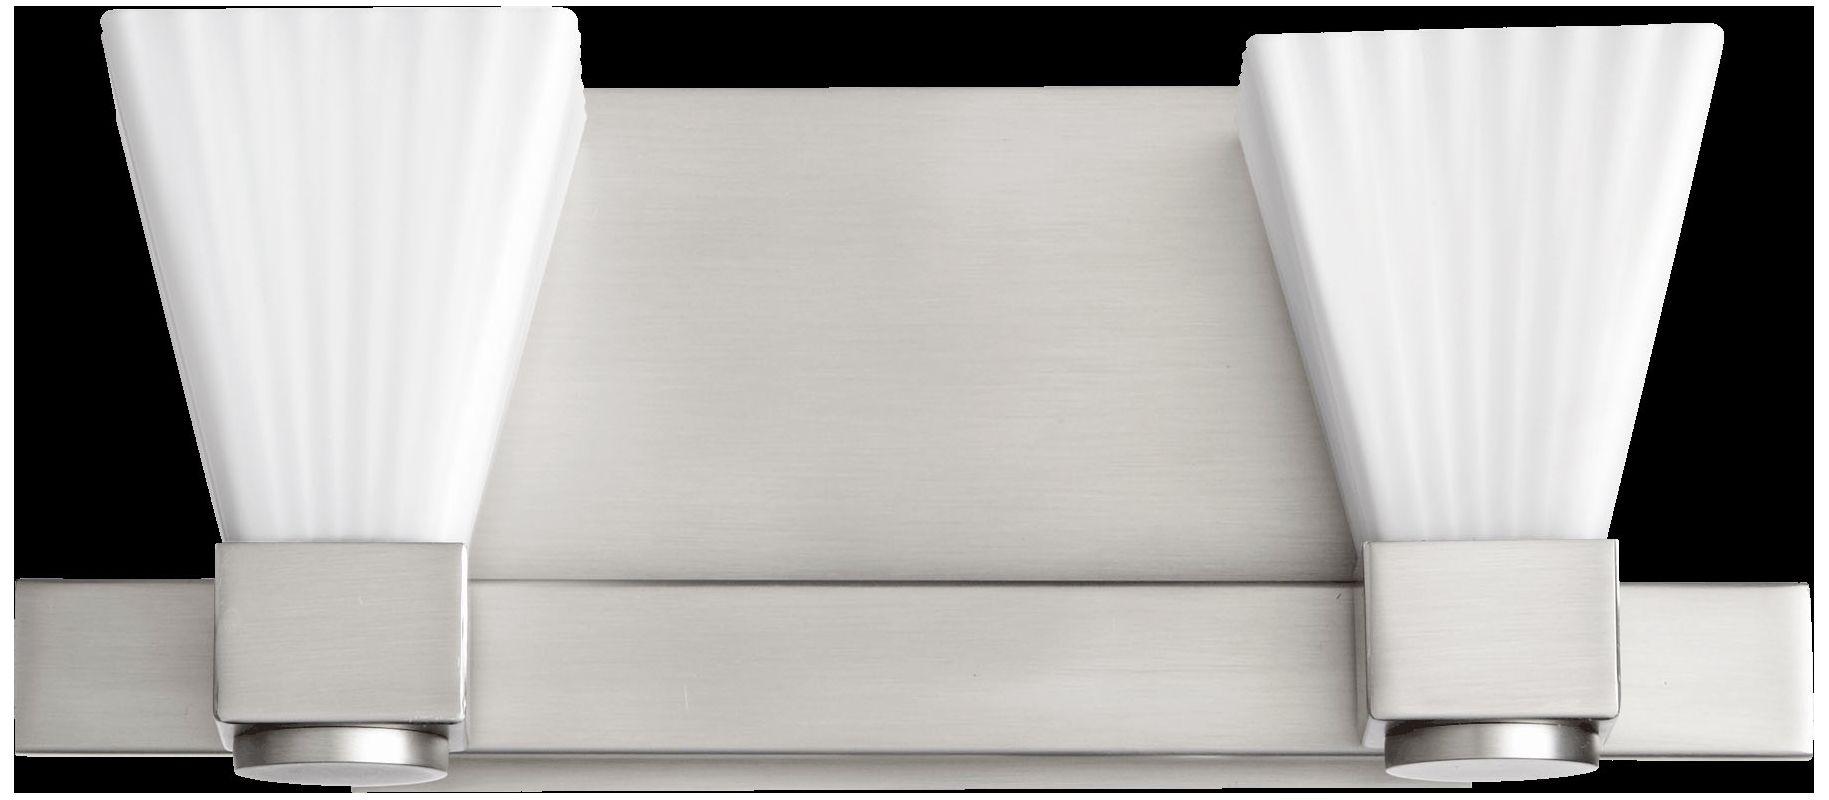 Quorum International 5671-2 2 Light Bathroom Vanity Light with Frosted